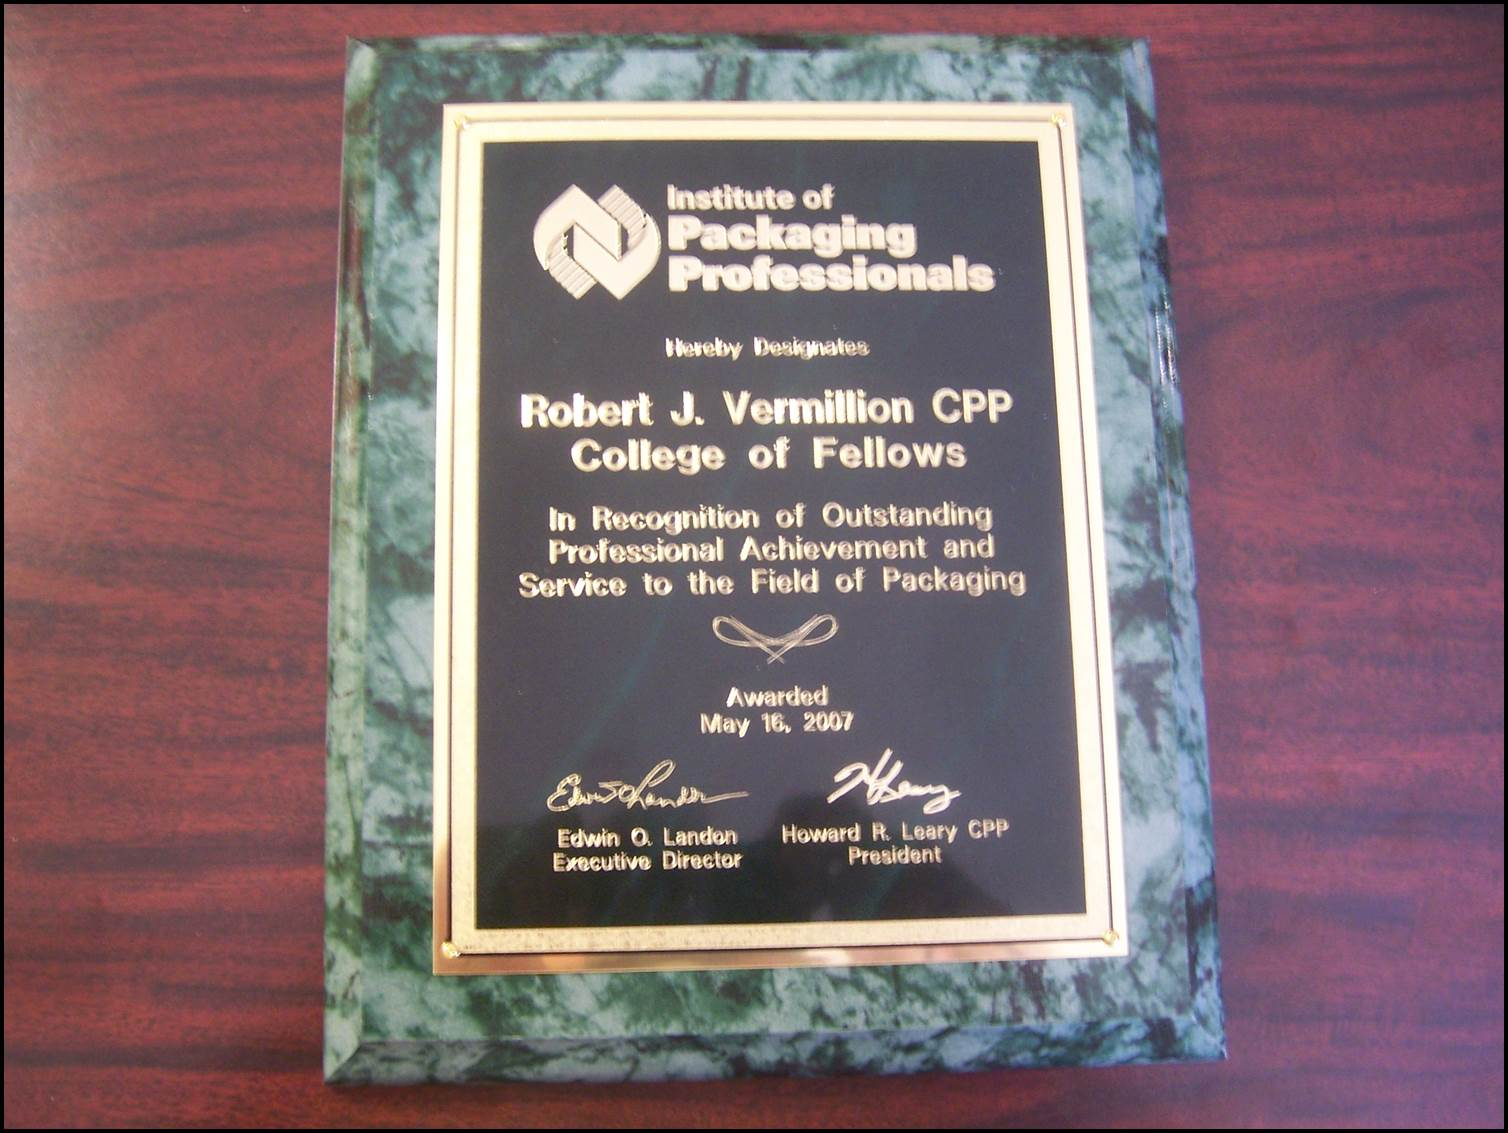 IOPP Award.Fellows